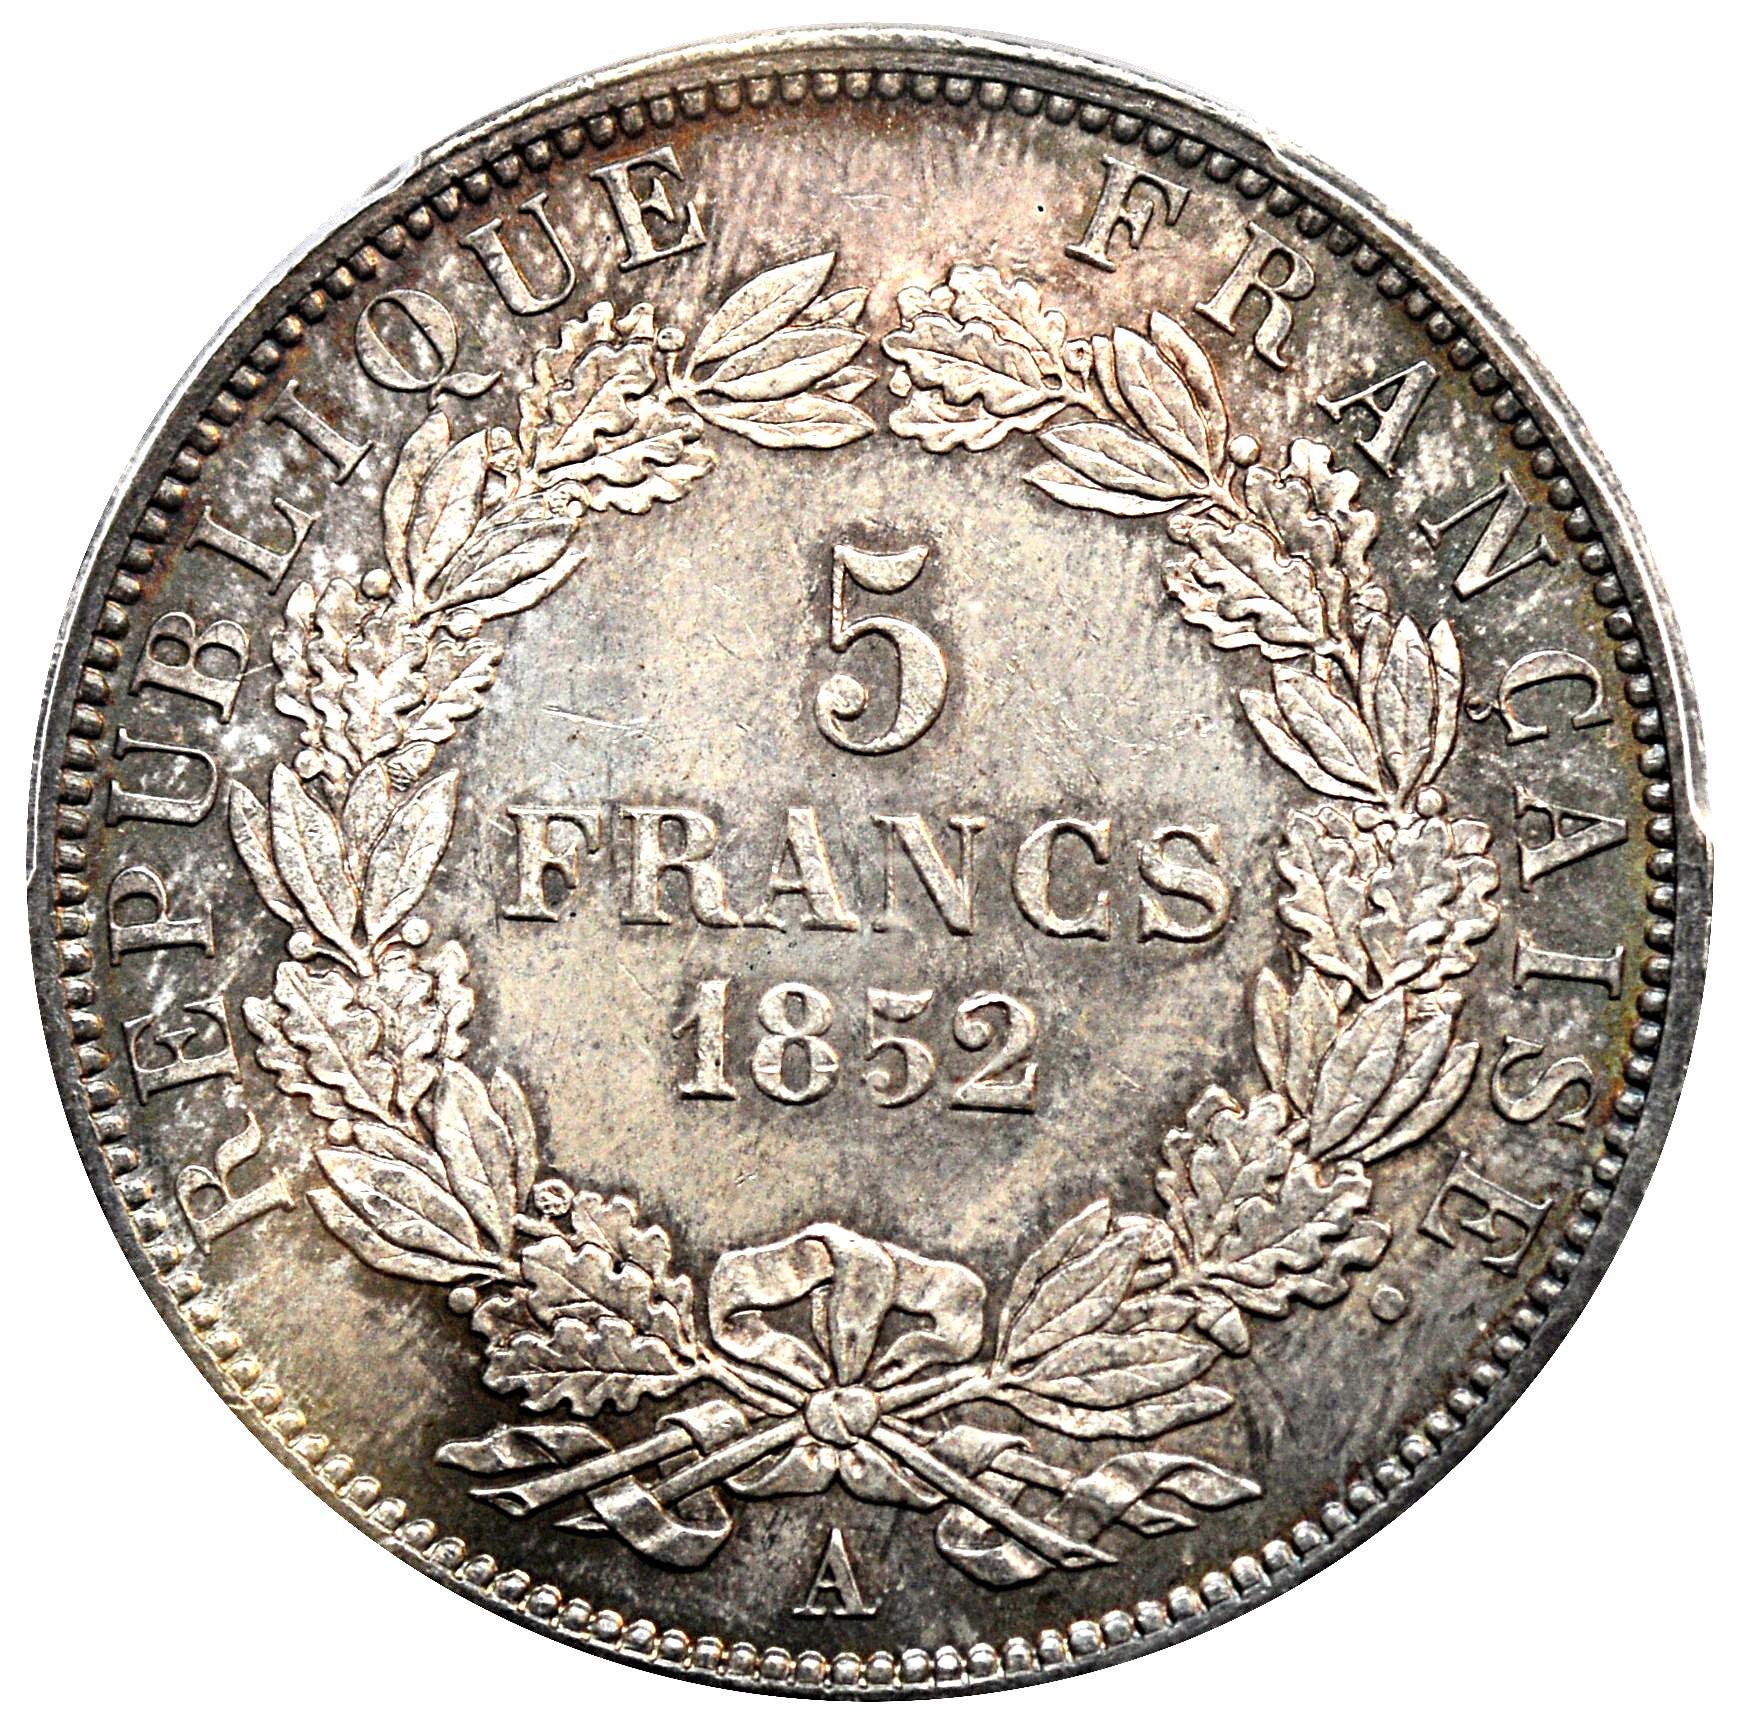 France 5 Francs (1852 Napoleon III)